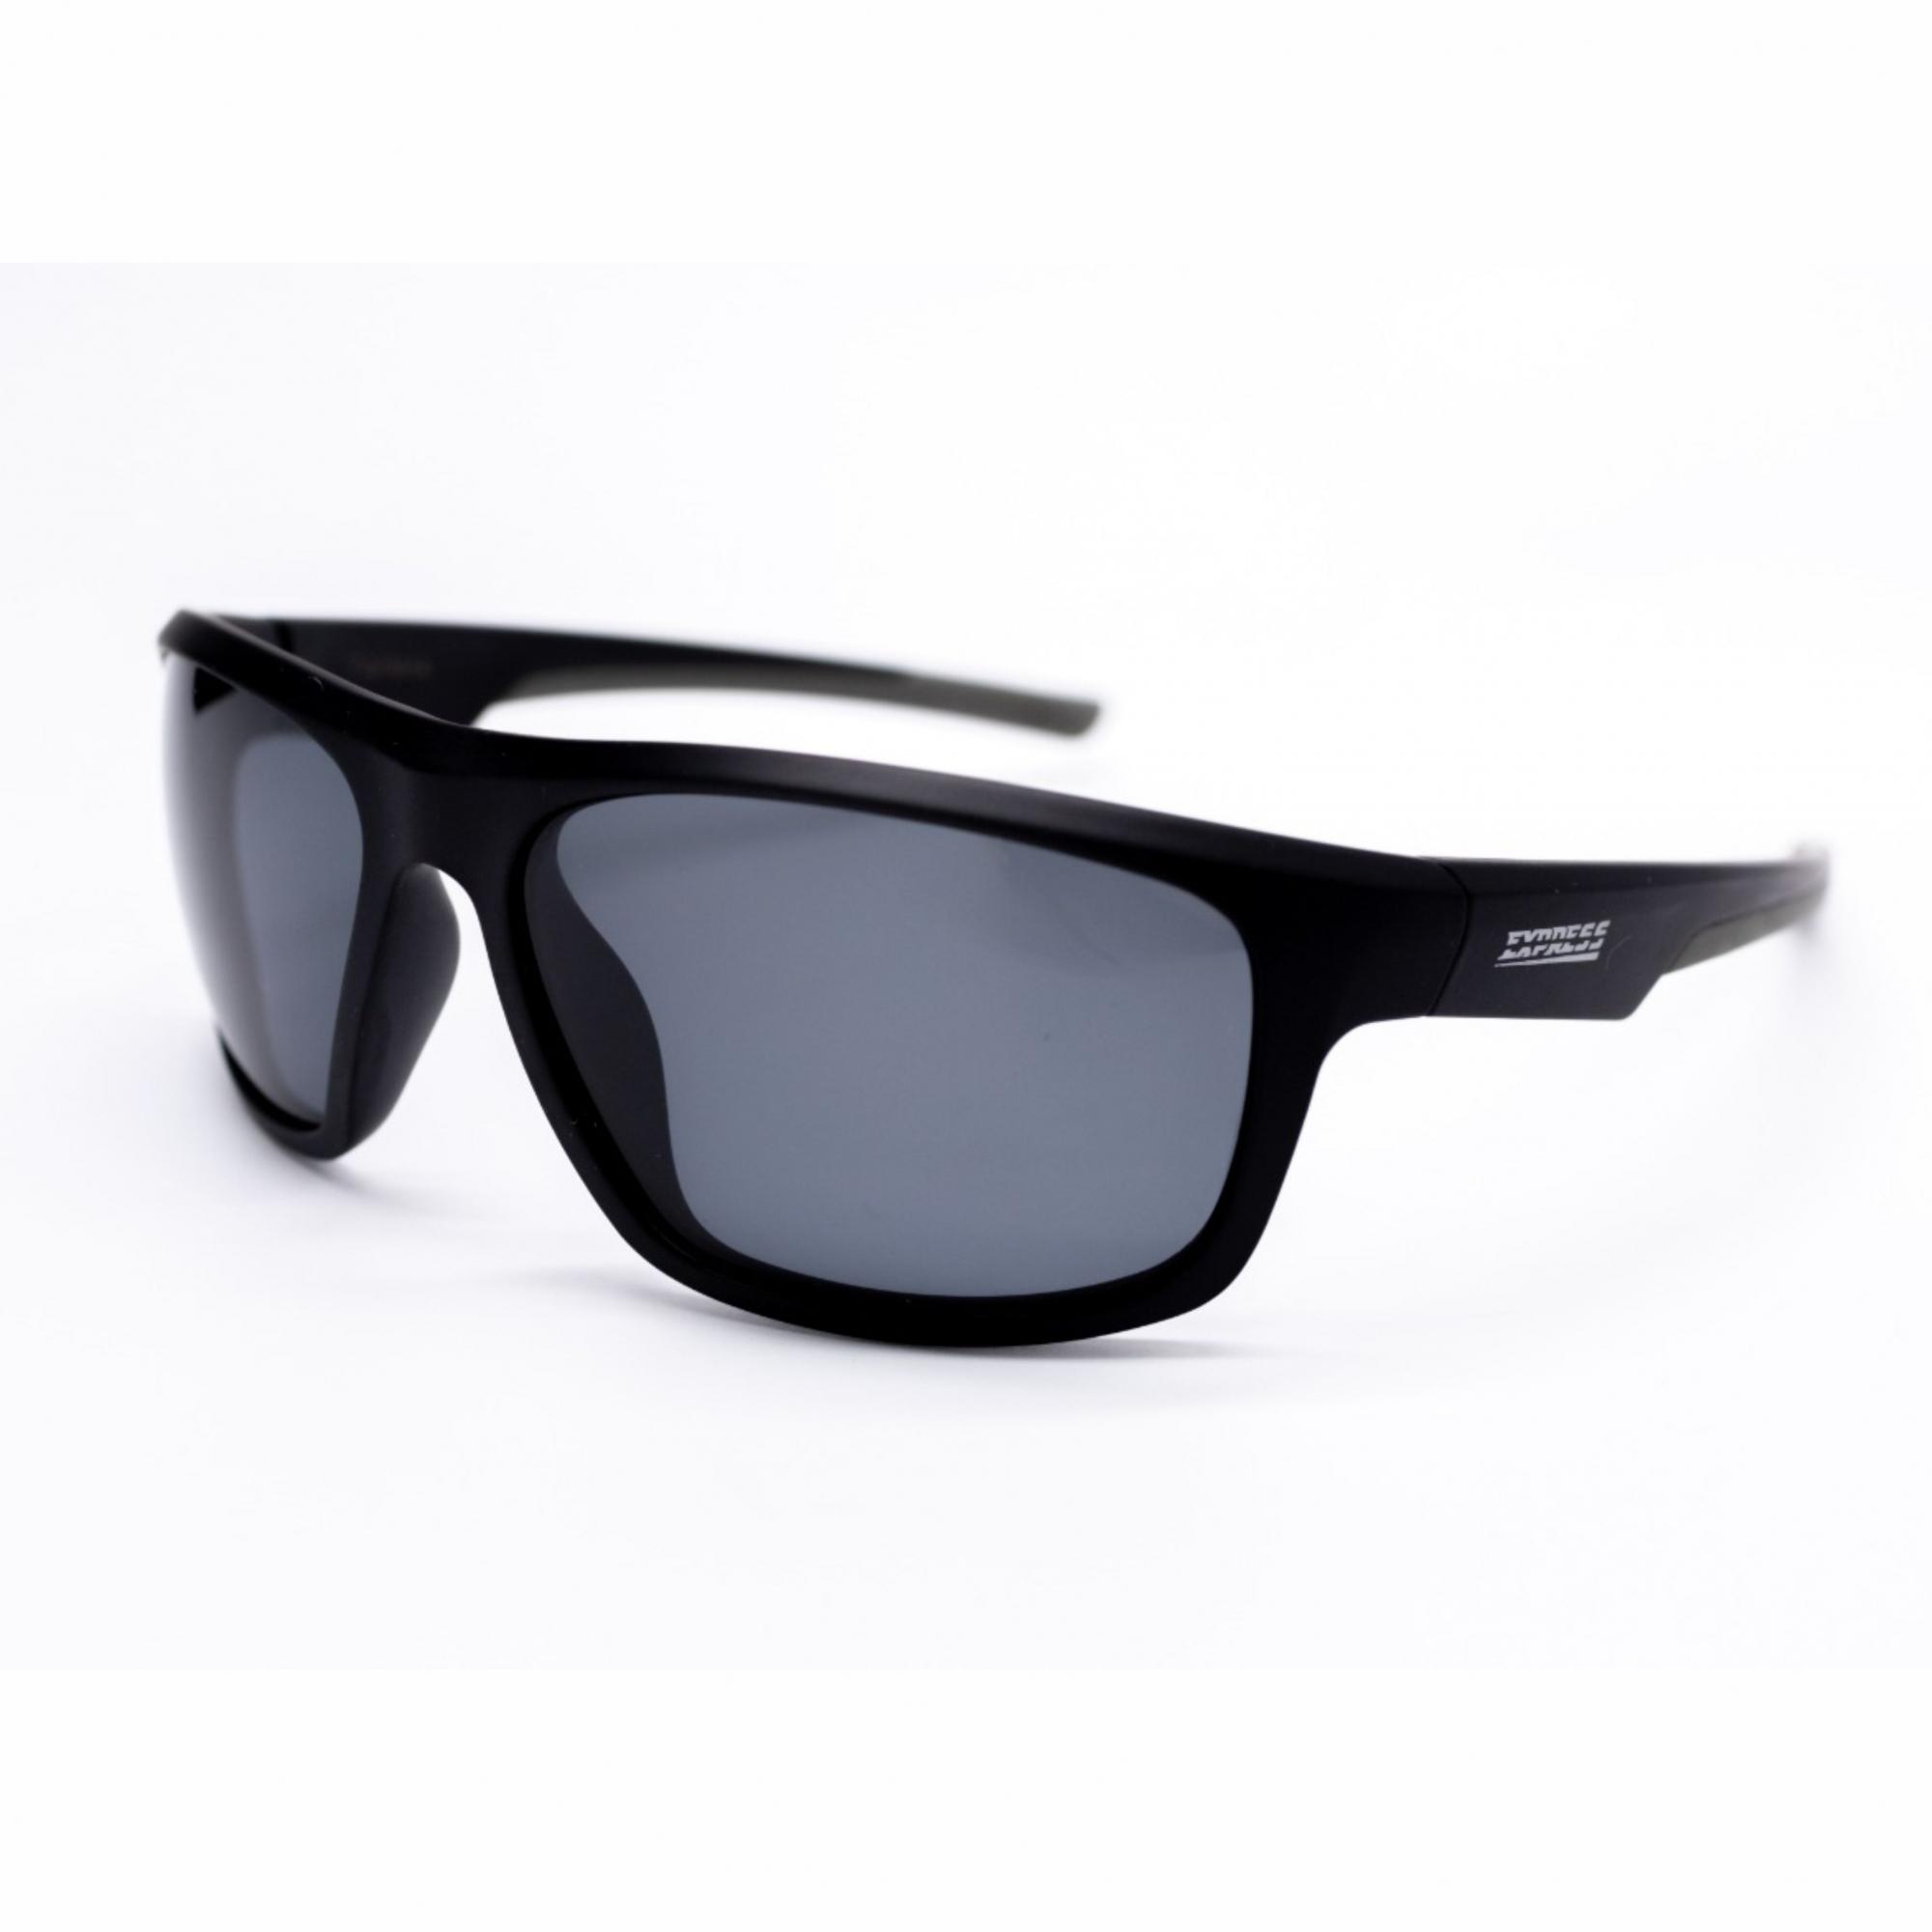 Óculos de Sol Polarizado Express Tainha Preto